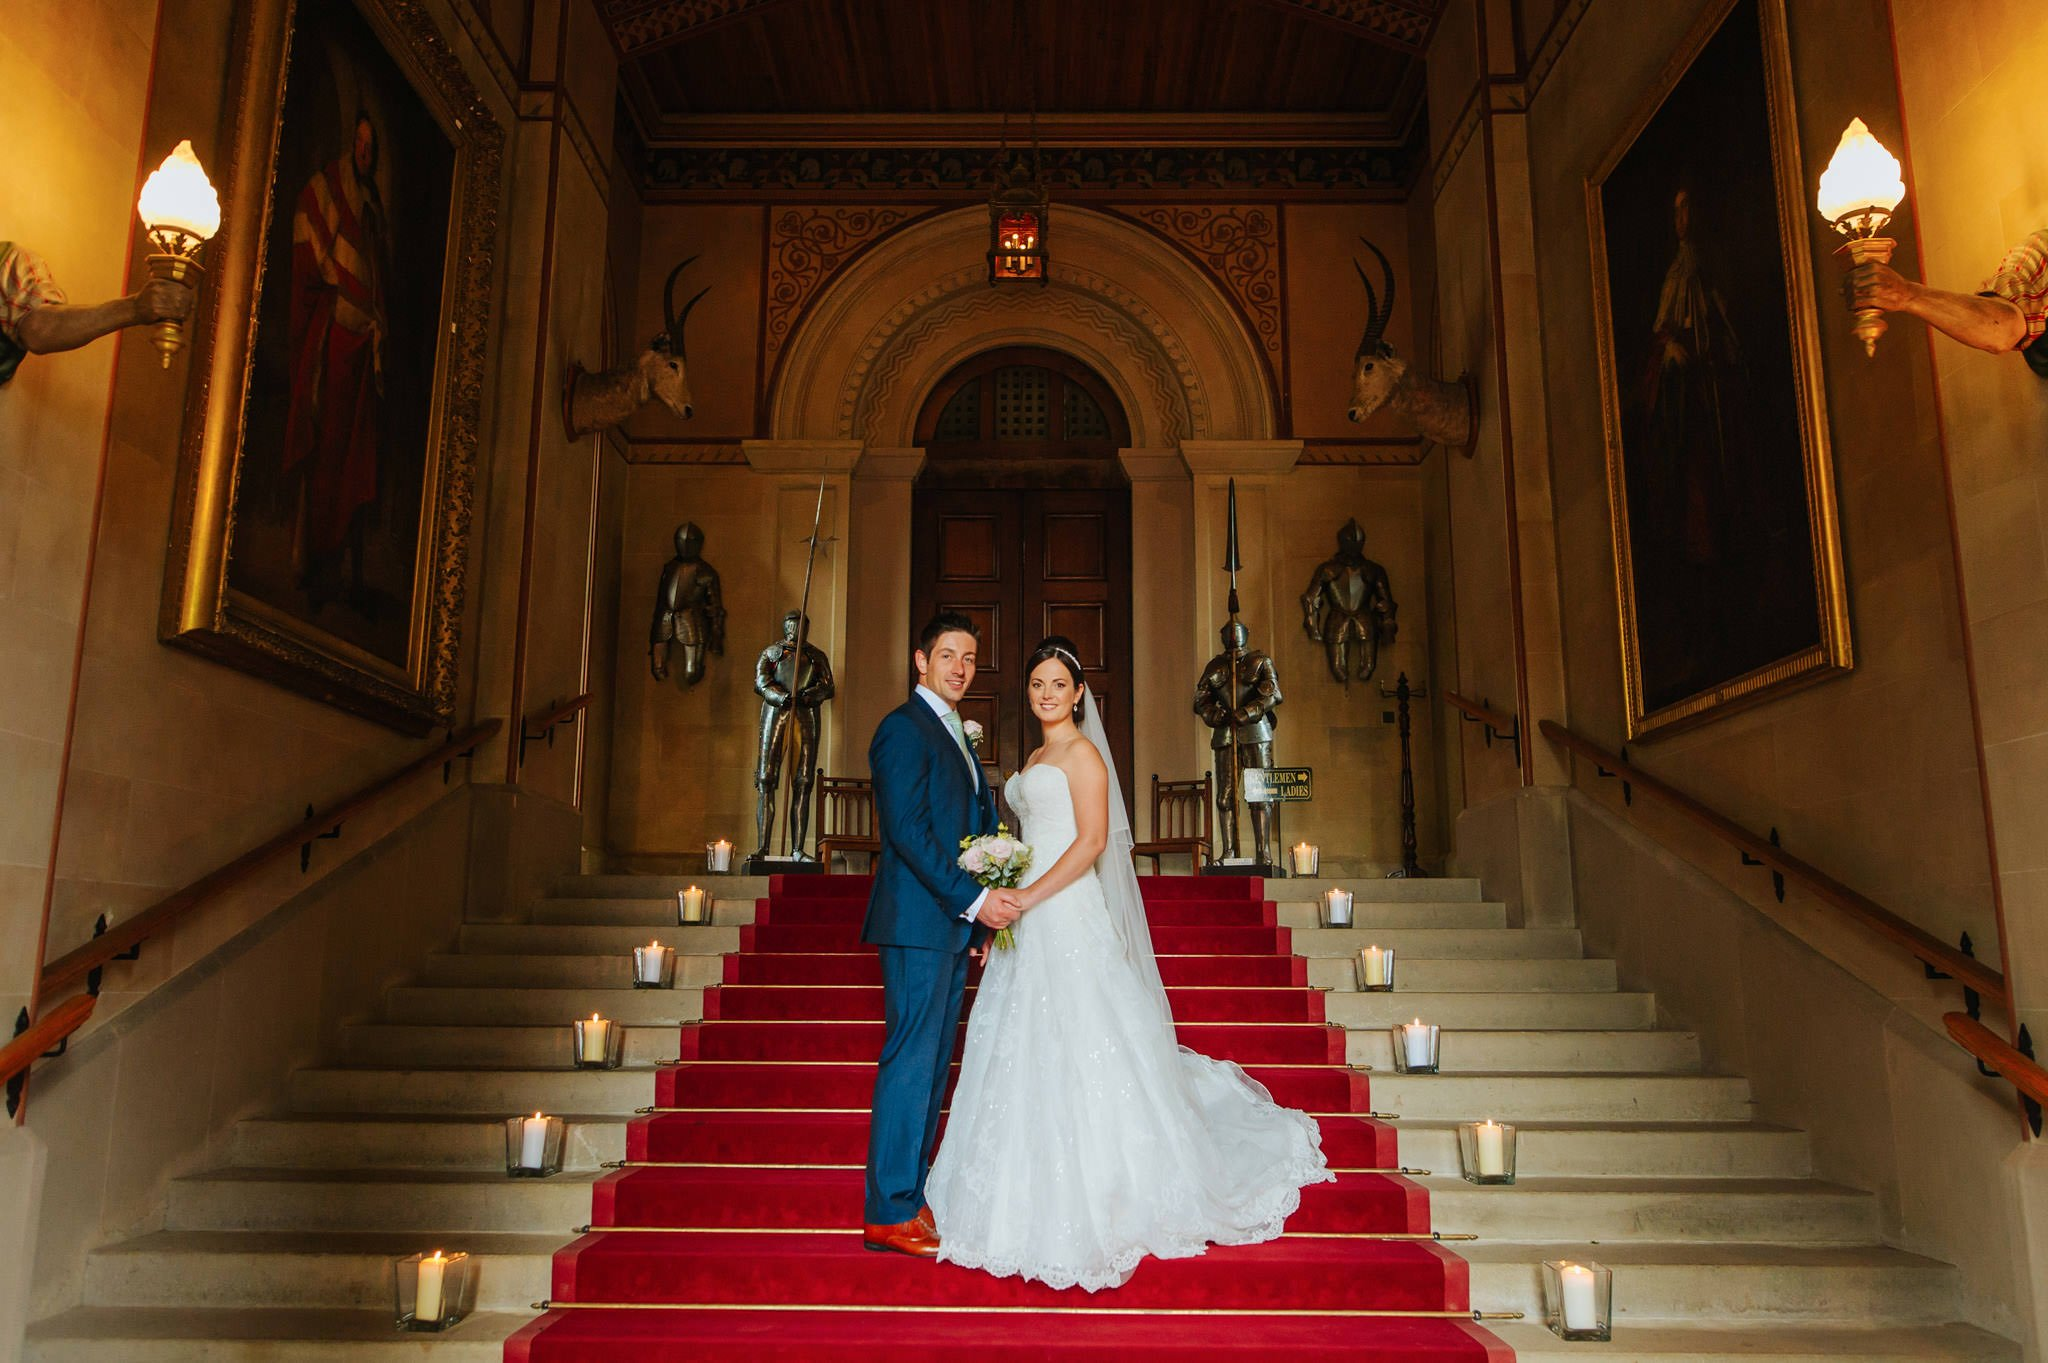 Eastnor Castle wedding photographer Herefordshire, West Midlands - Sarah + Dean 56